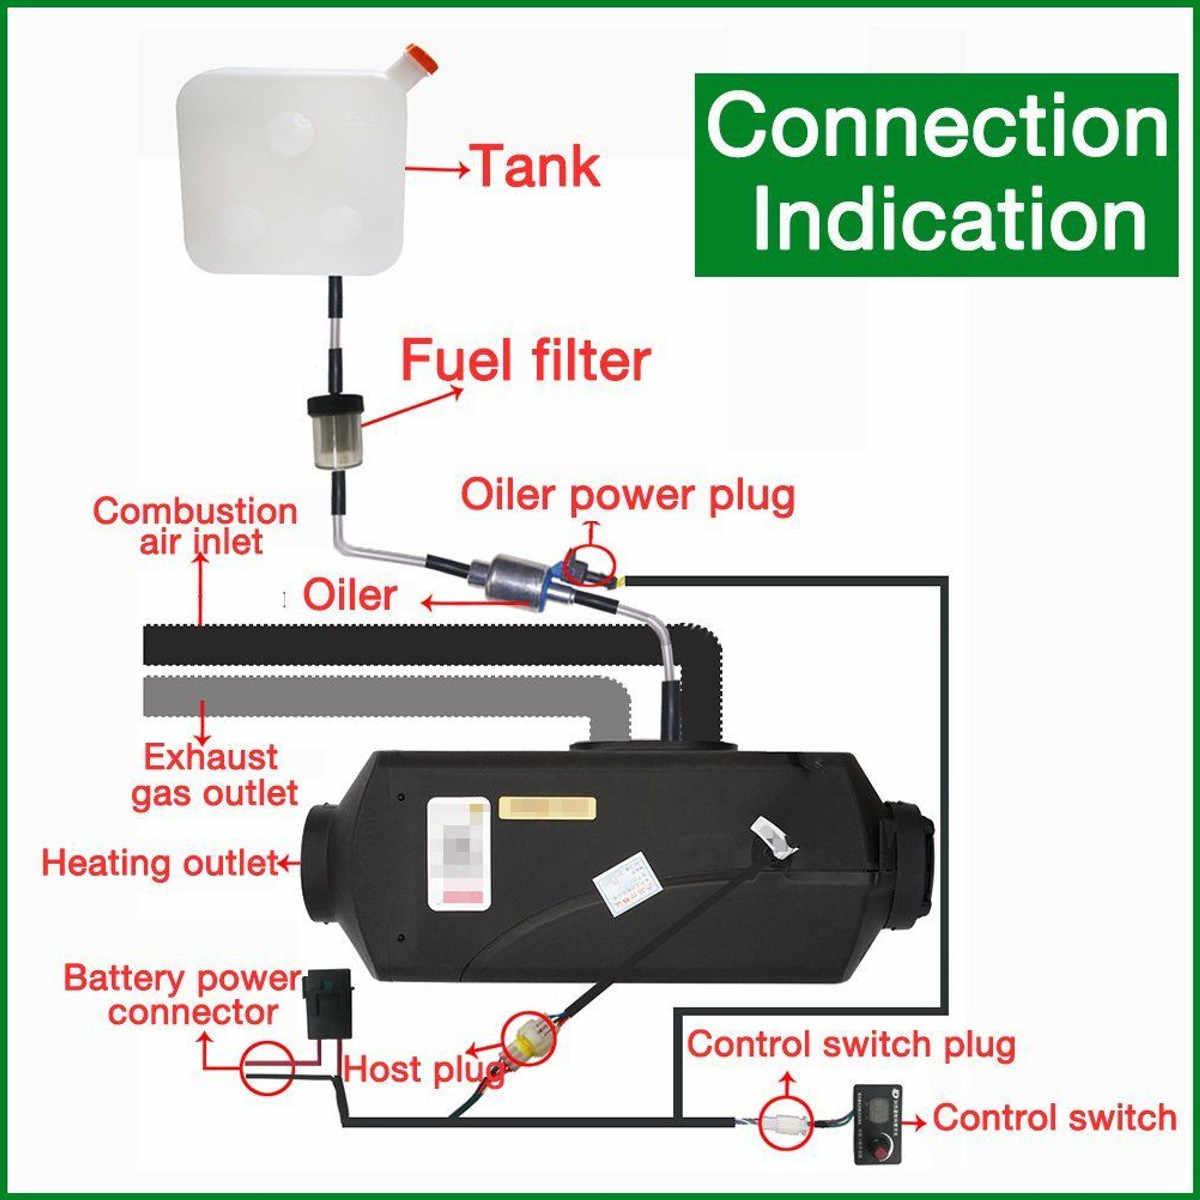 12V 2KW Mobil Mesin Diesel Parkir Udara Pemanas Mobil Pemanas LCD Remote Control Monitor Switch + untuk Truk Bus Trailer pemanas